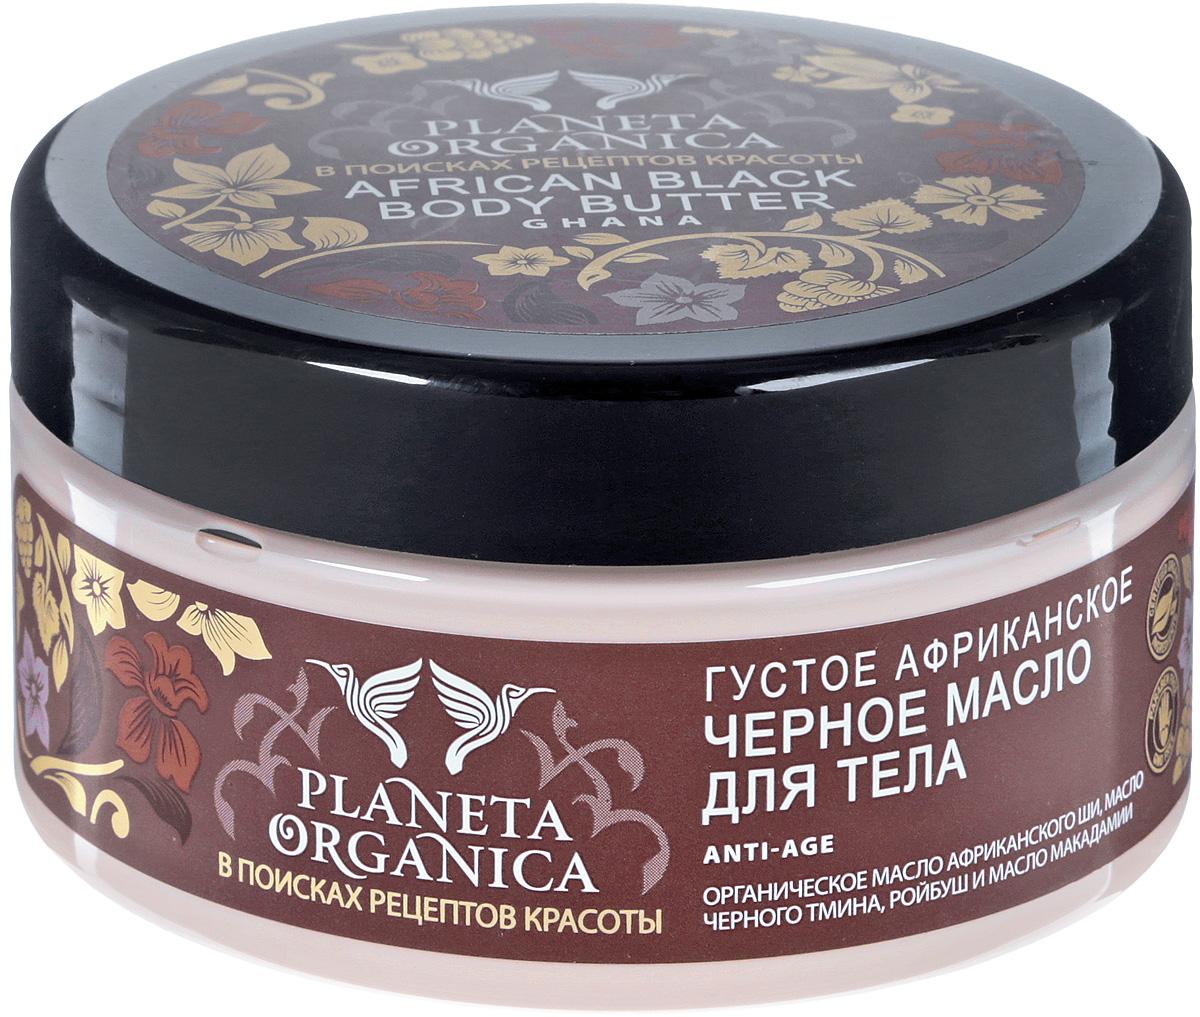 Planeta Organica Масло для тела